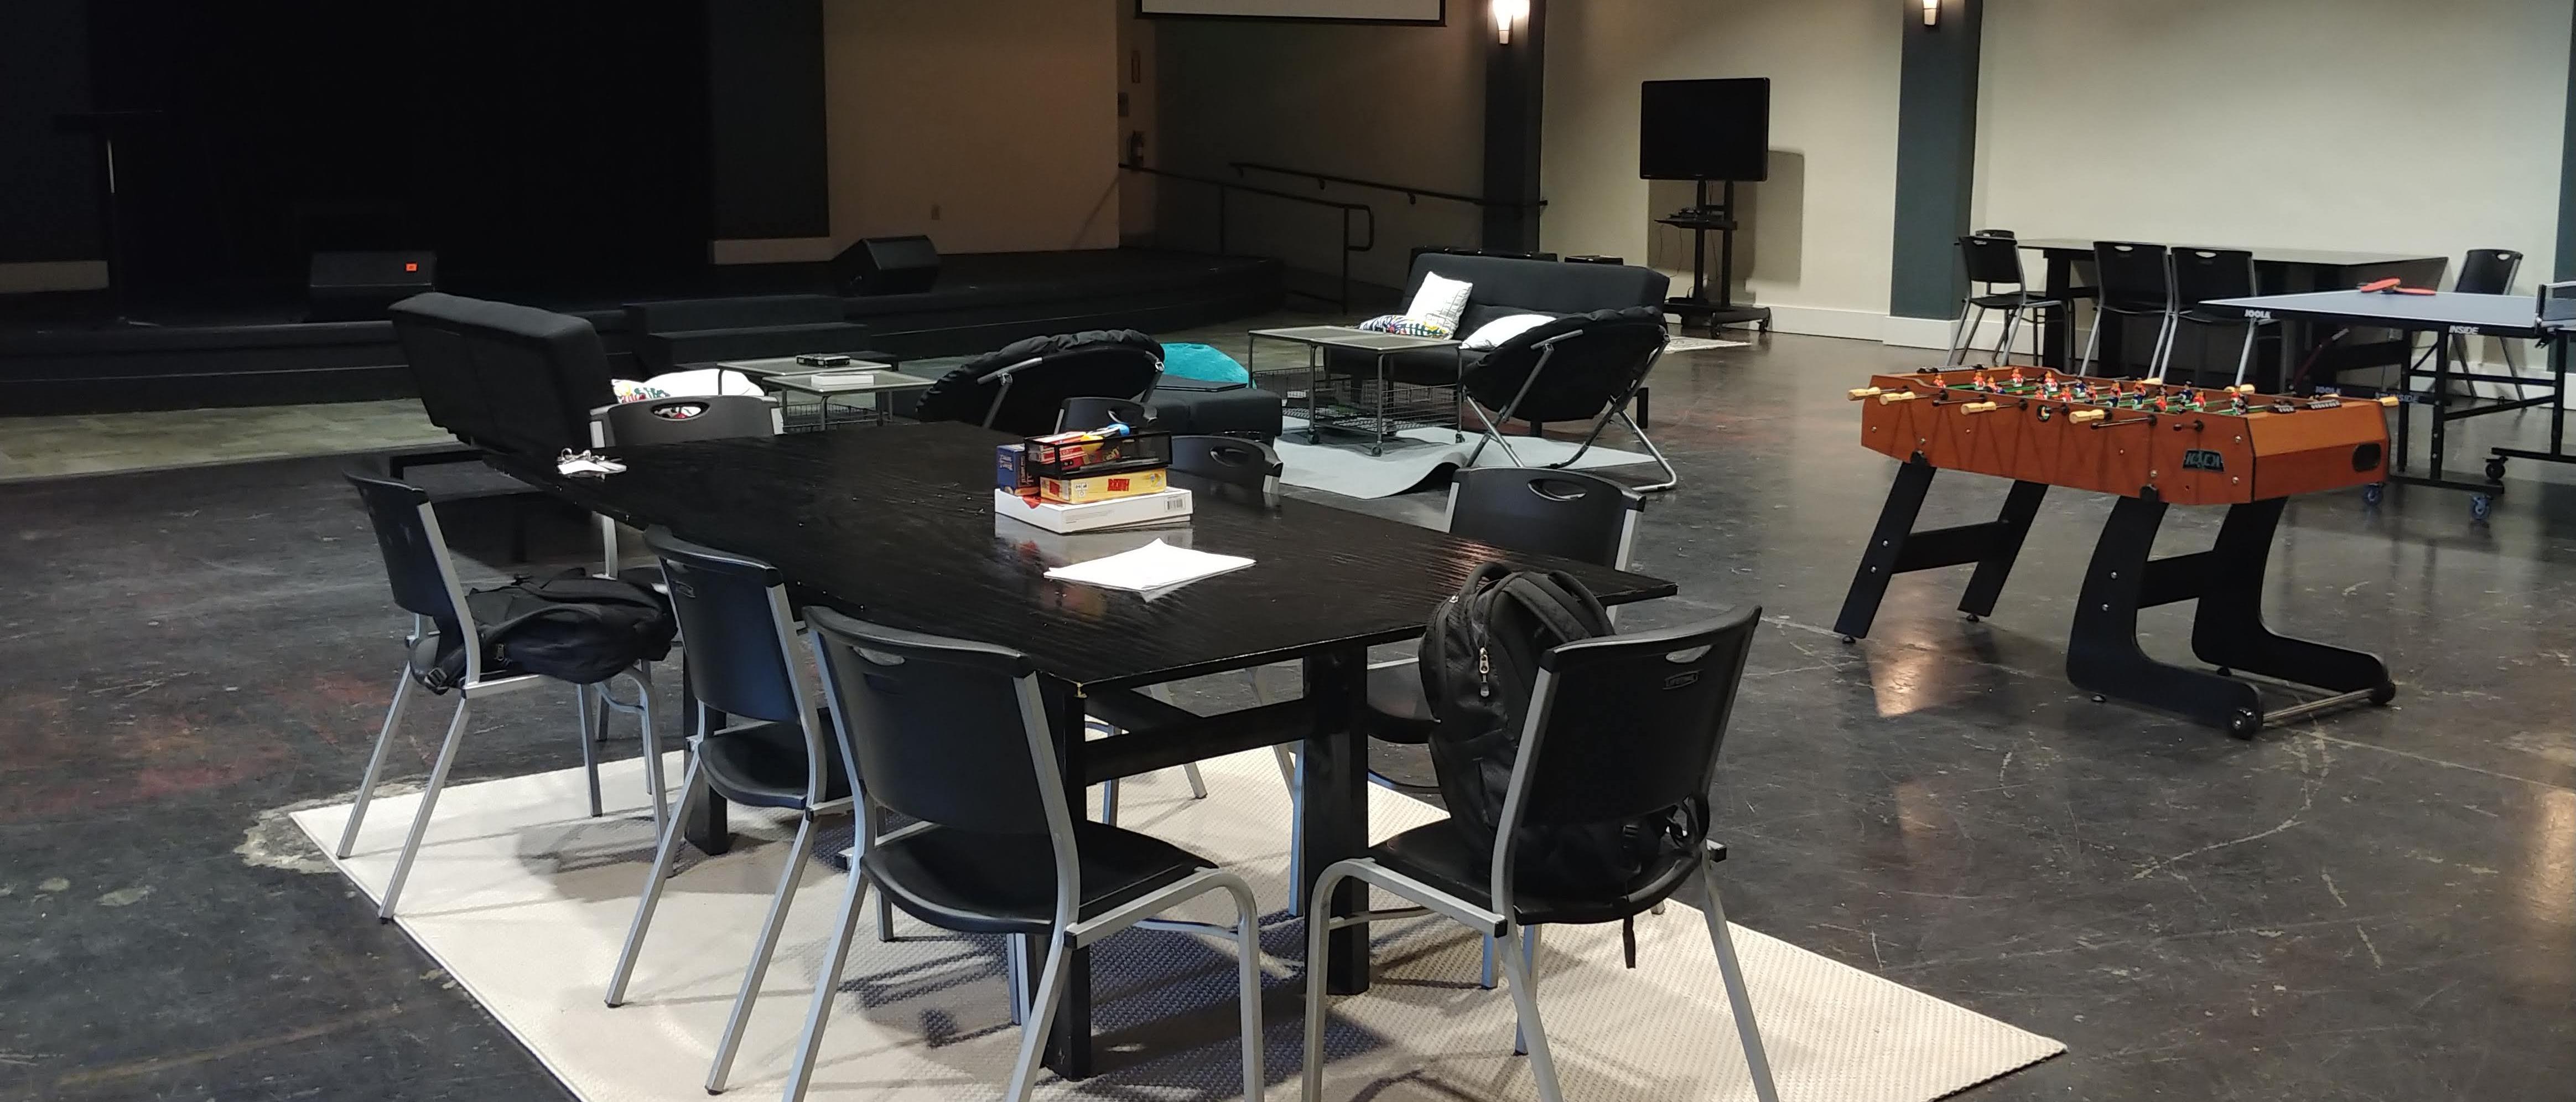 Sacramento Youth Centers Layout